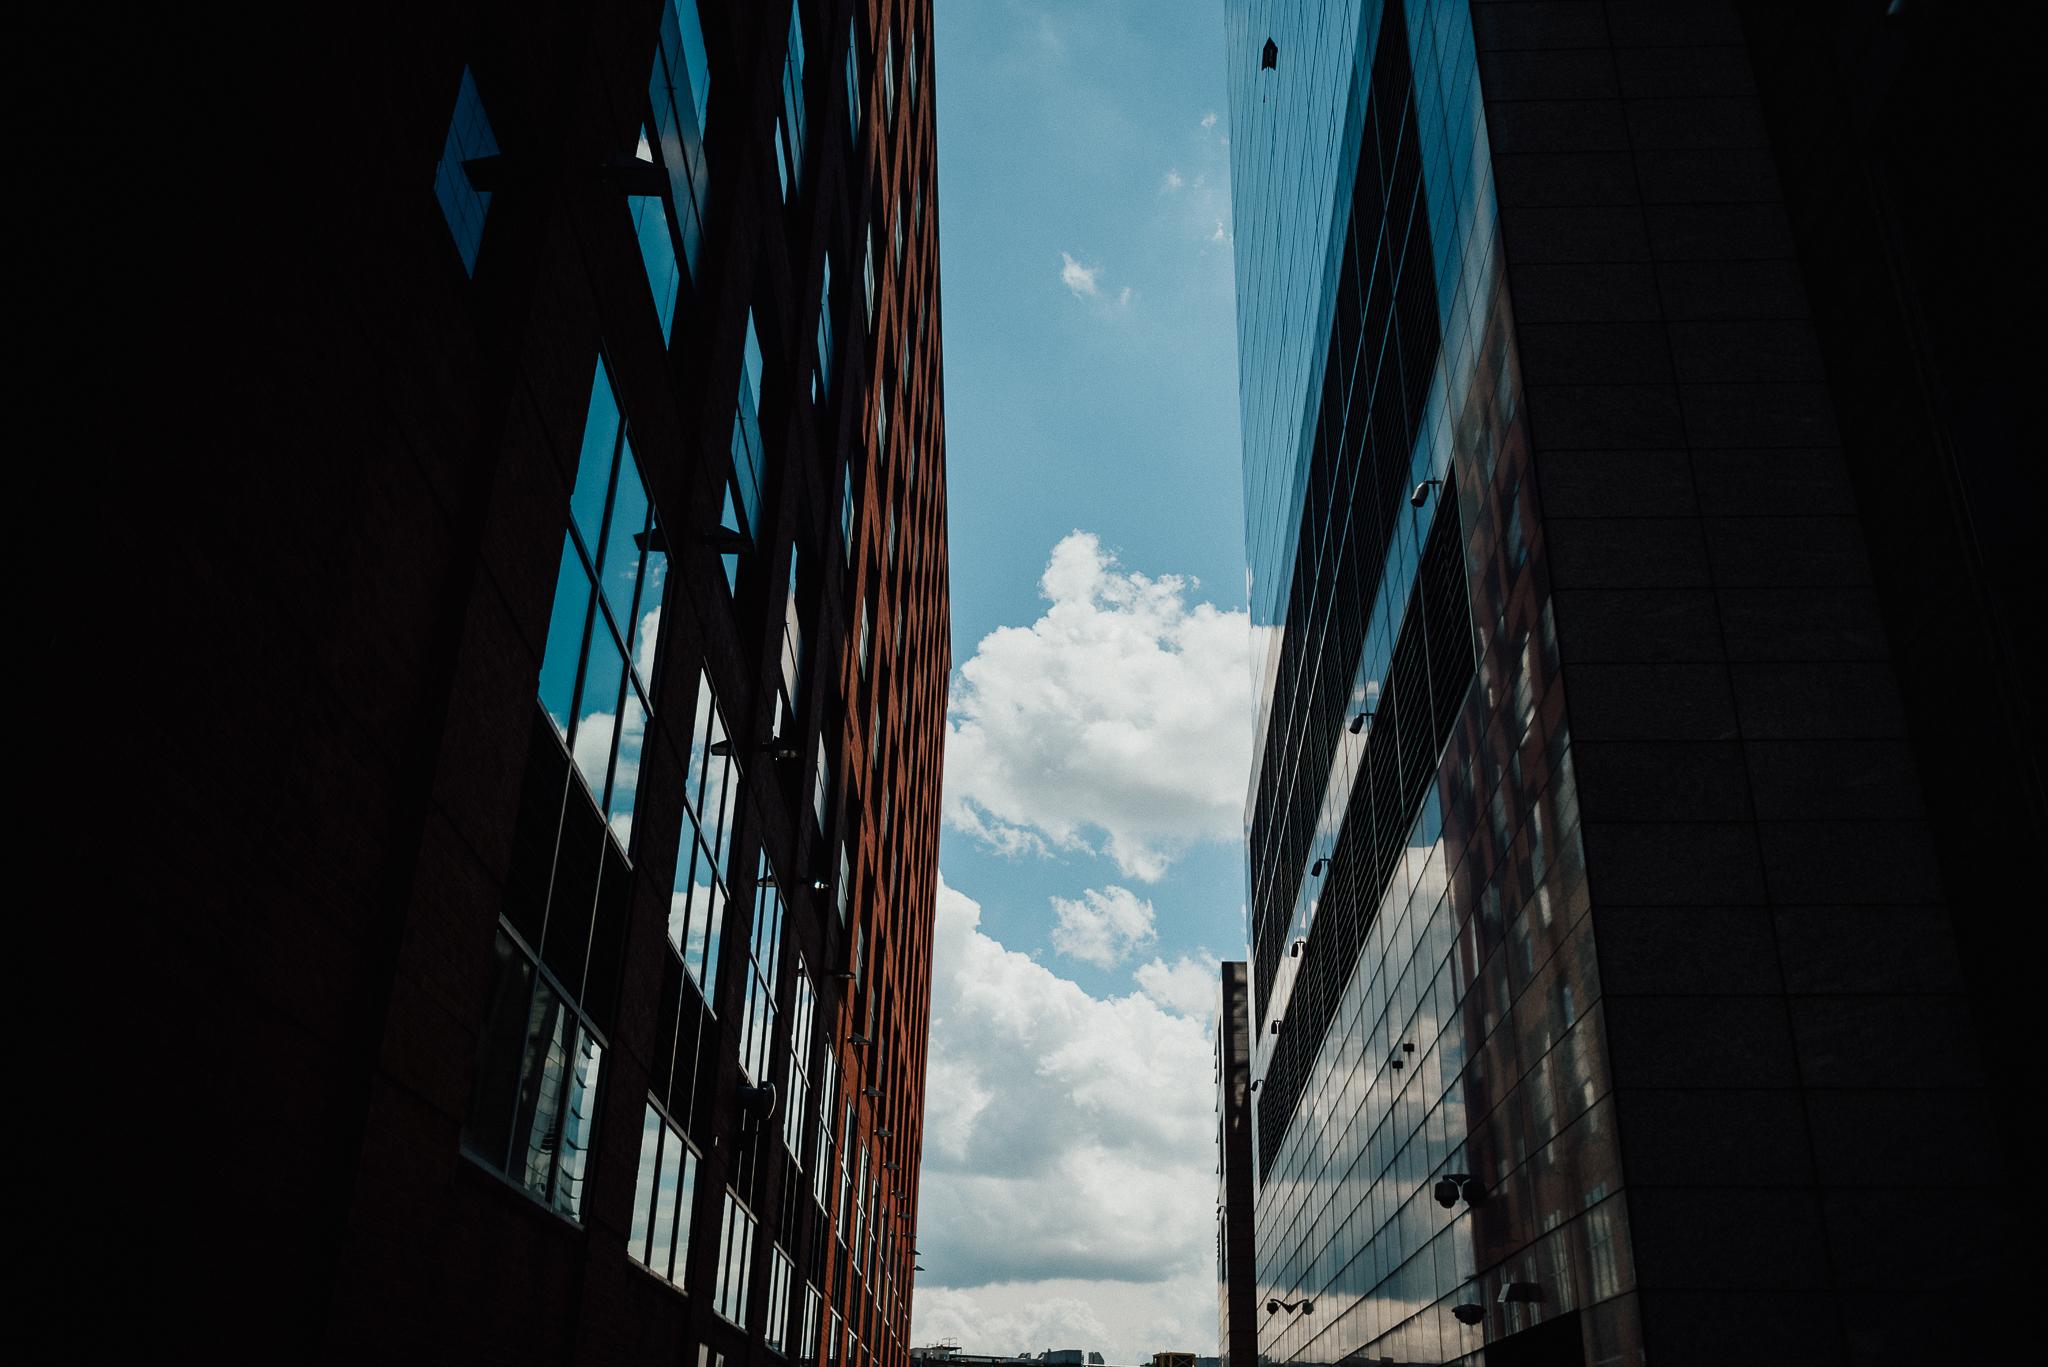 boston_blog-4.jpg